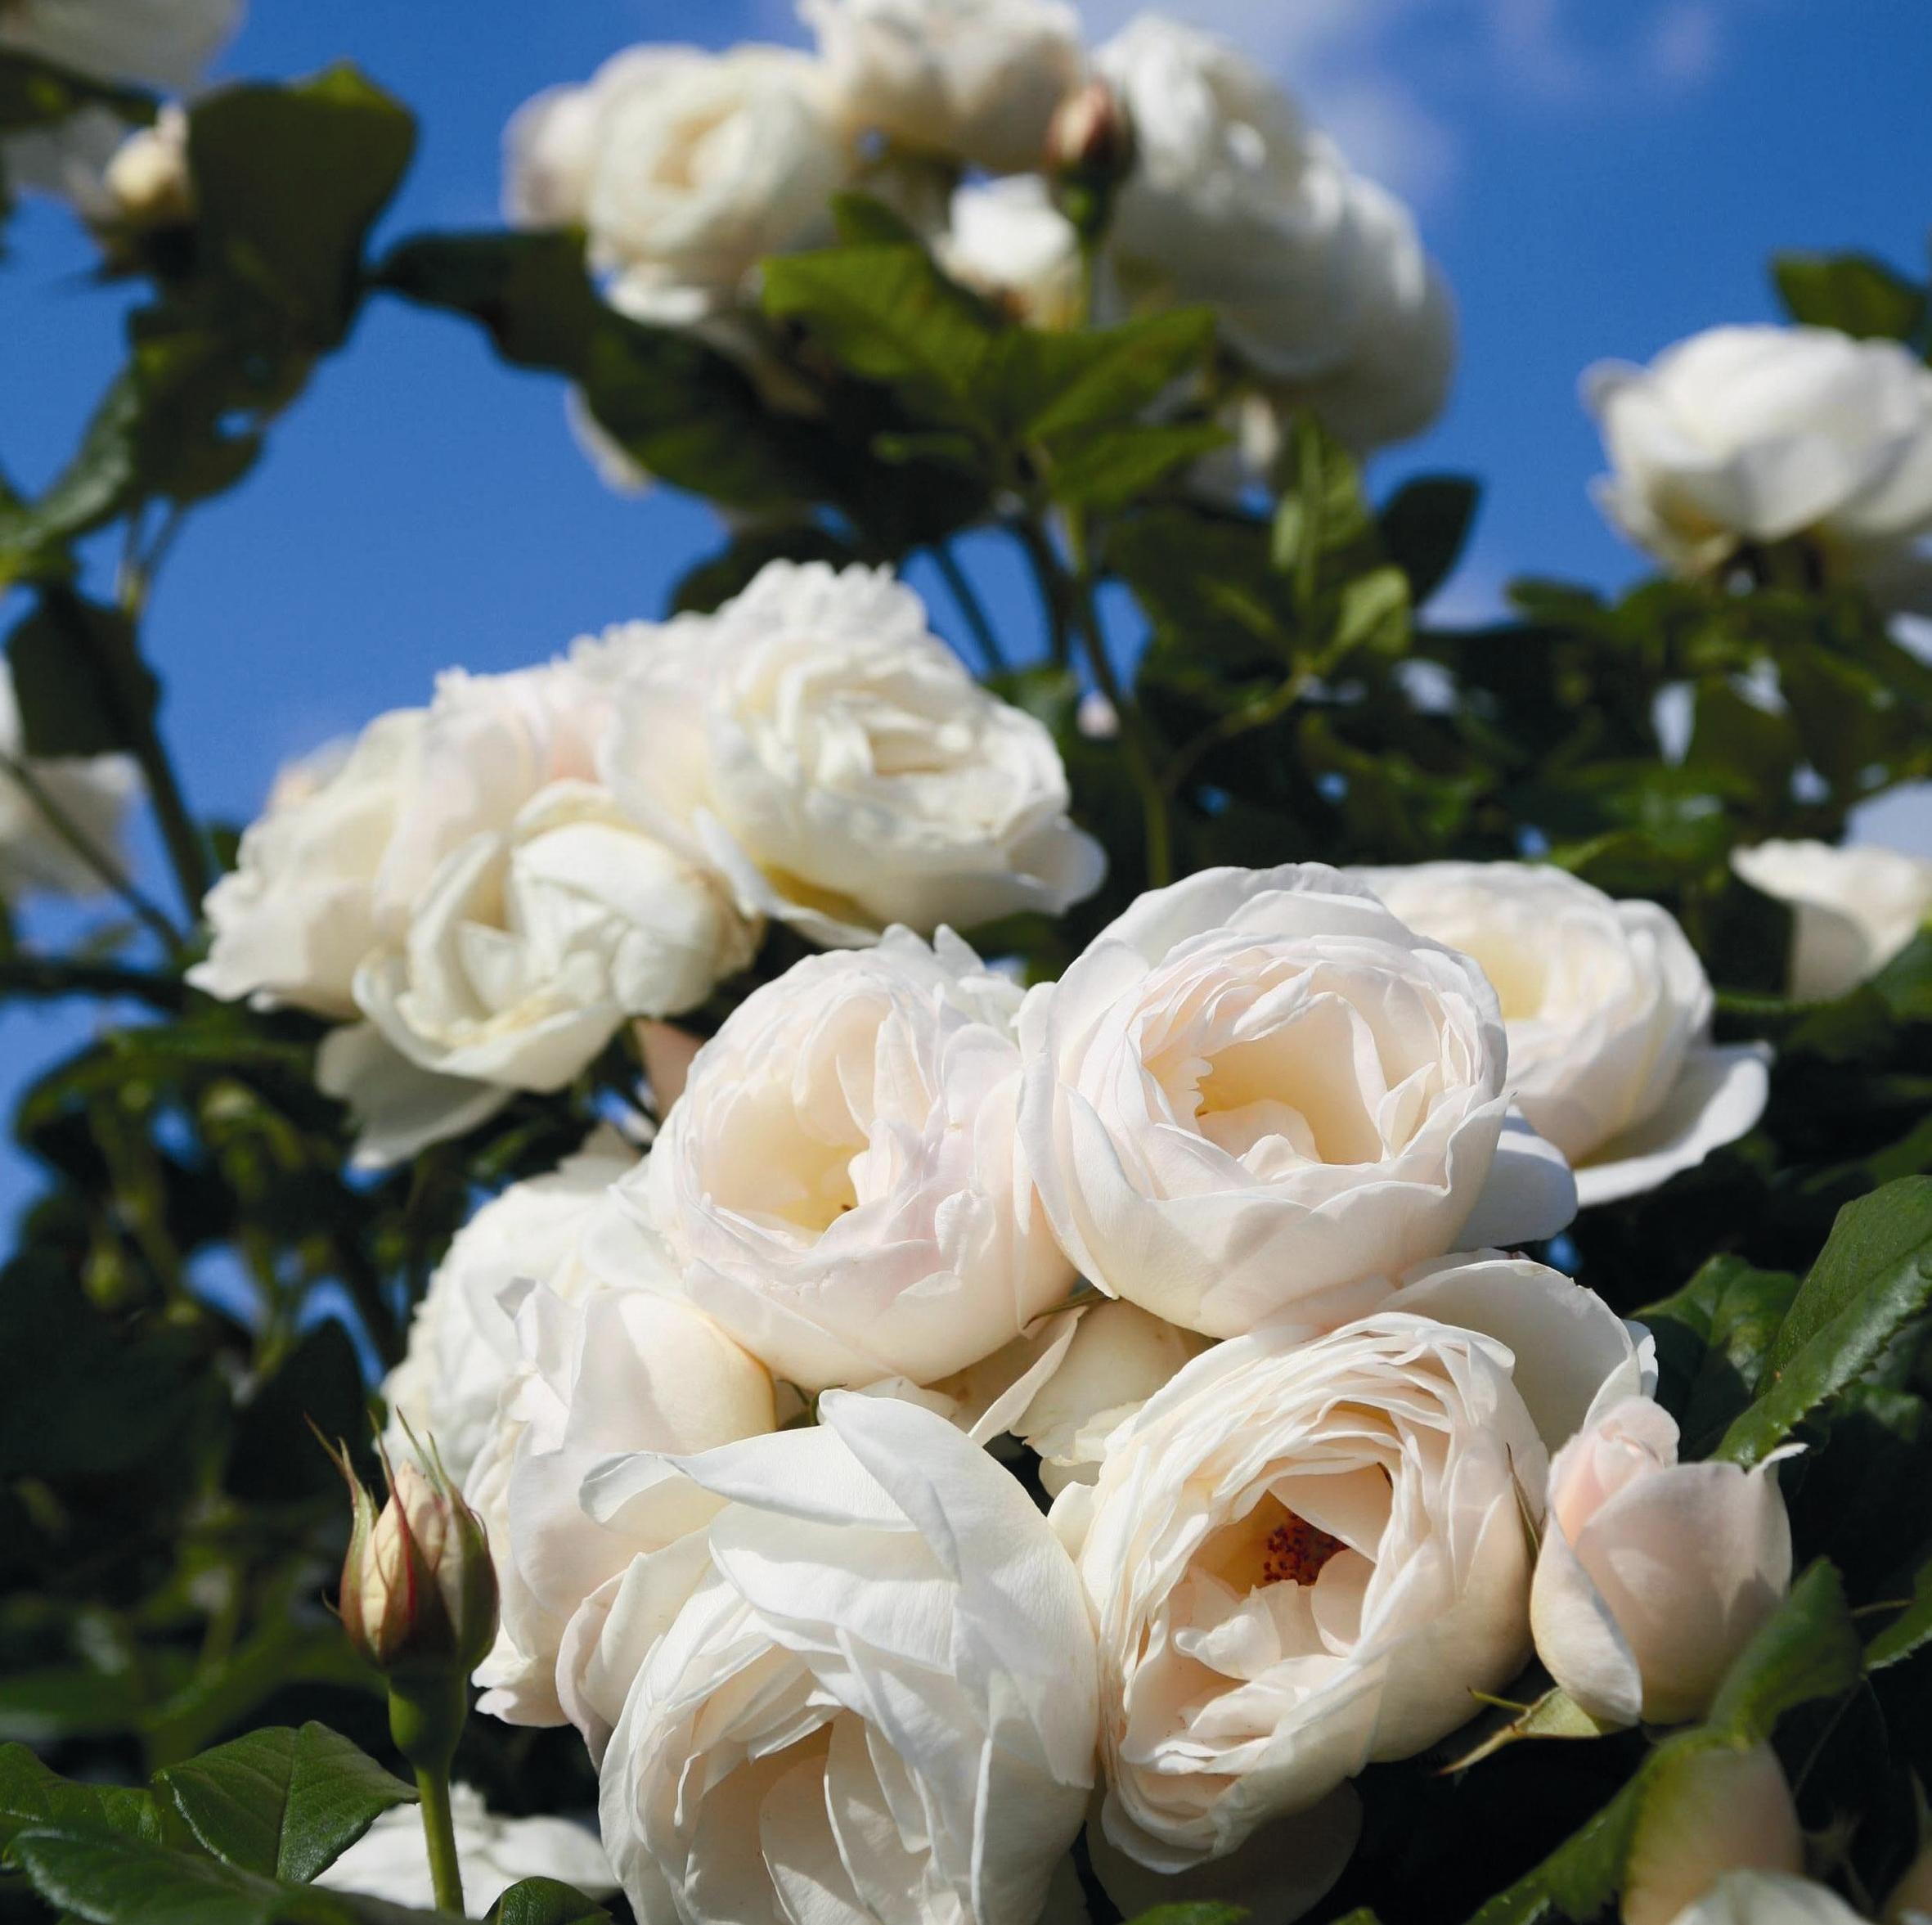 uetersener klosterrose online kaufen rosen tantau. Black Bedroom Furniture Sets. Home Design Ideas